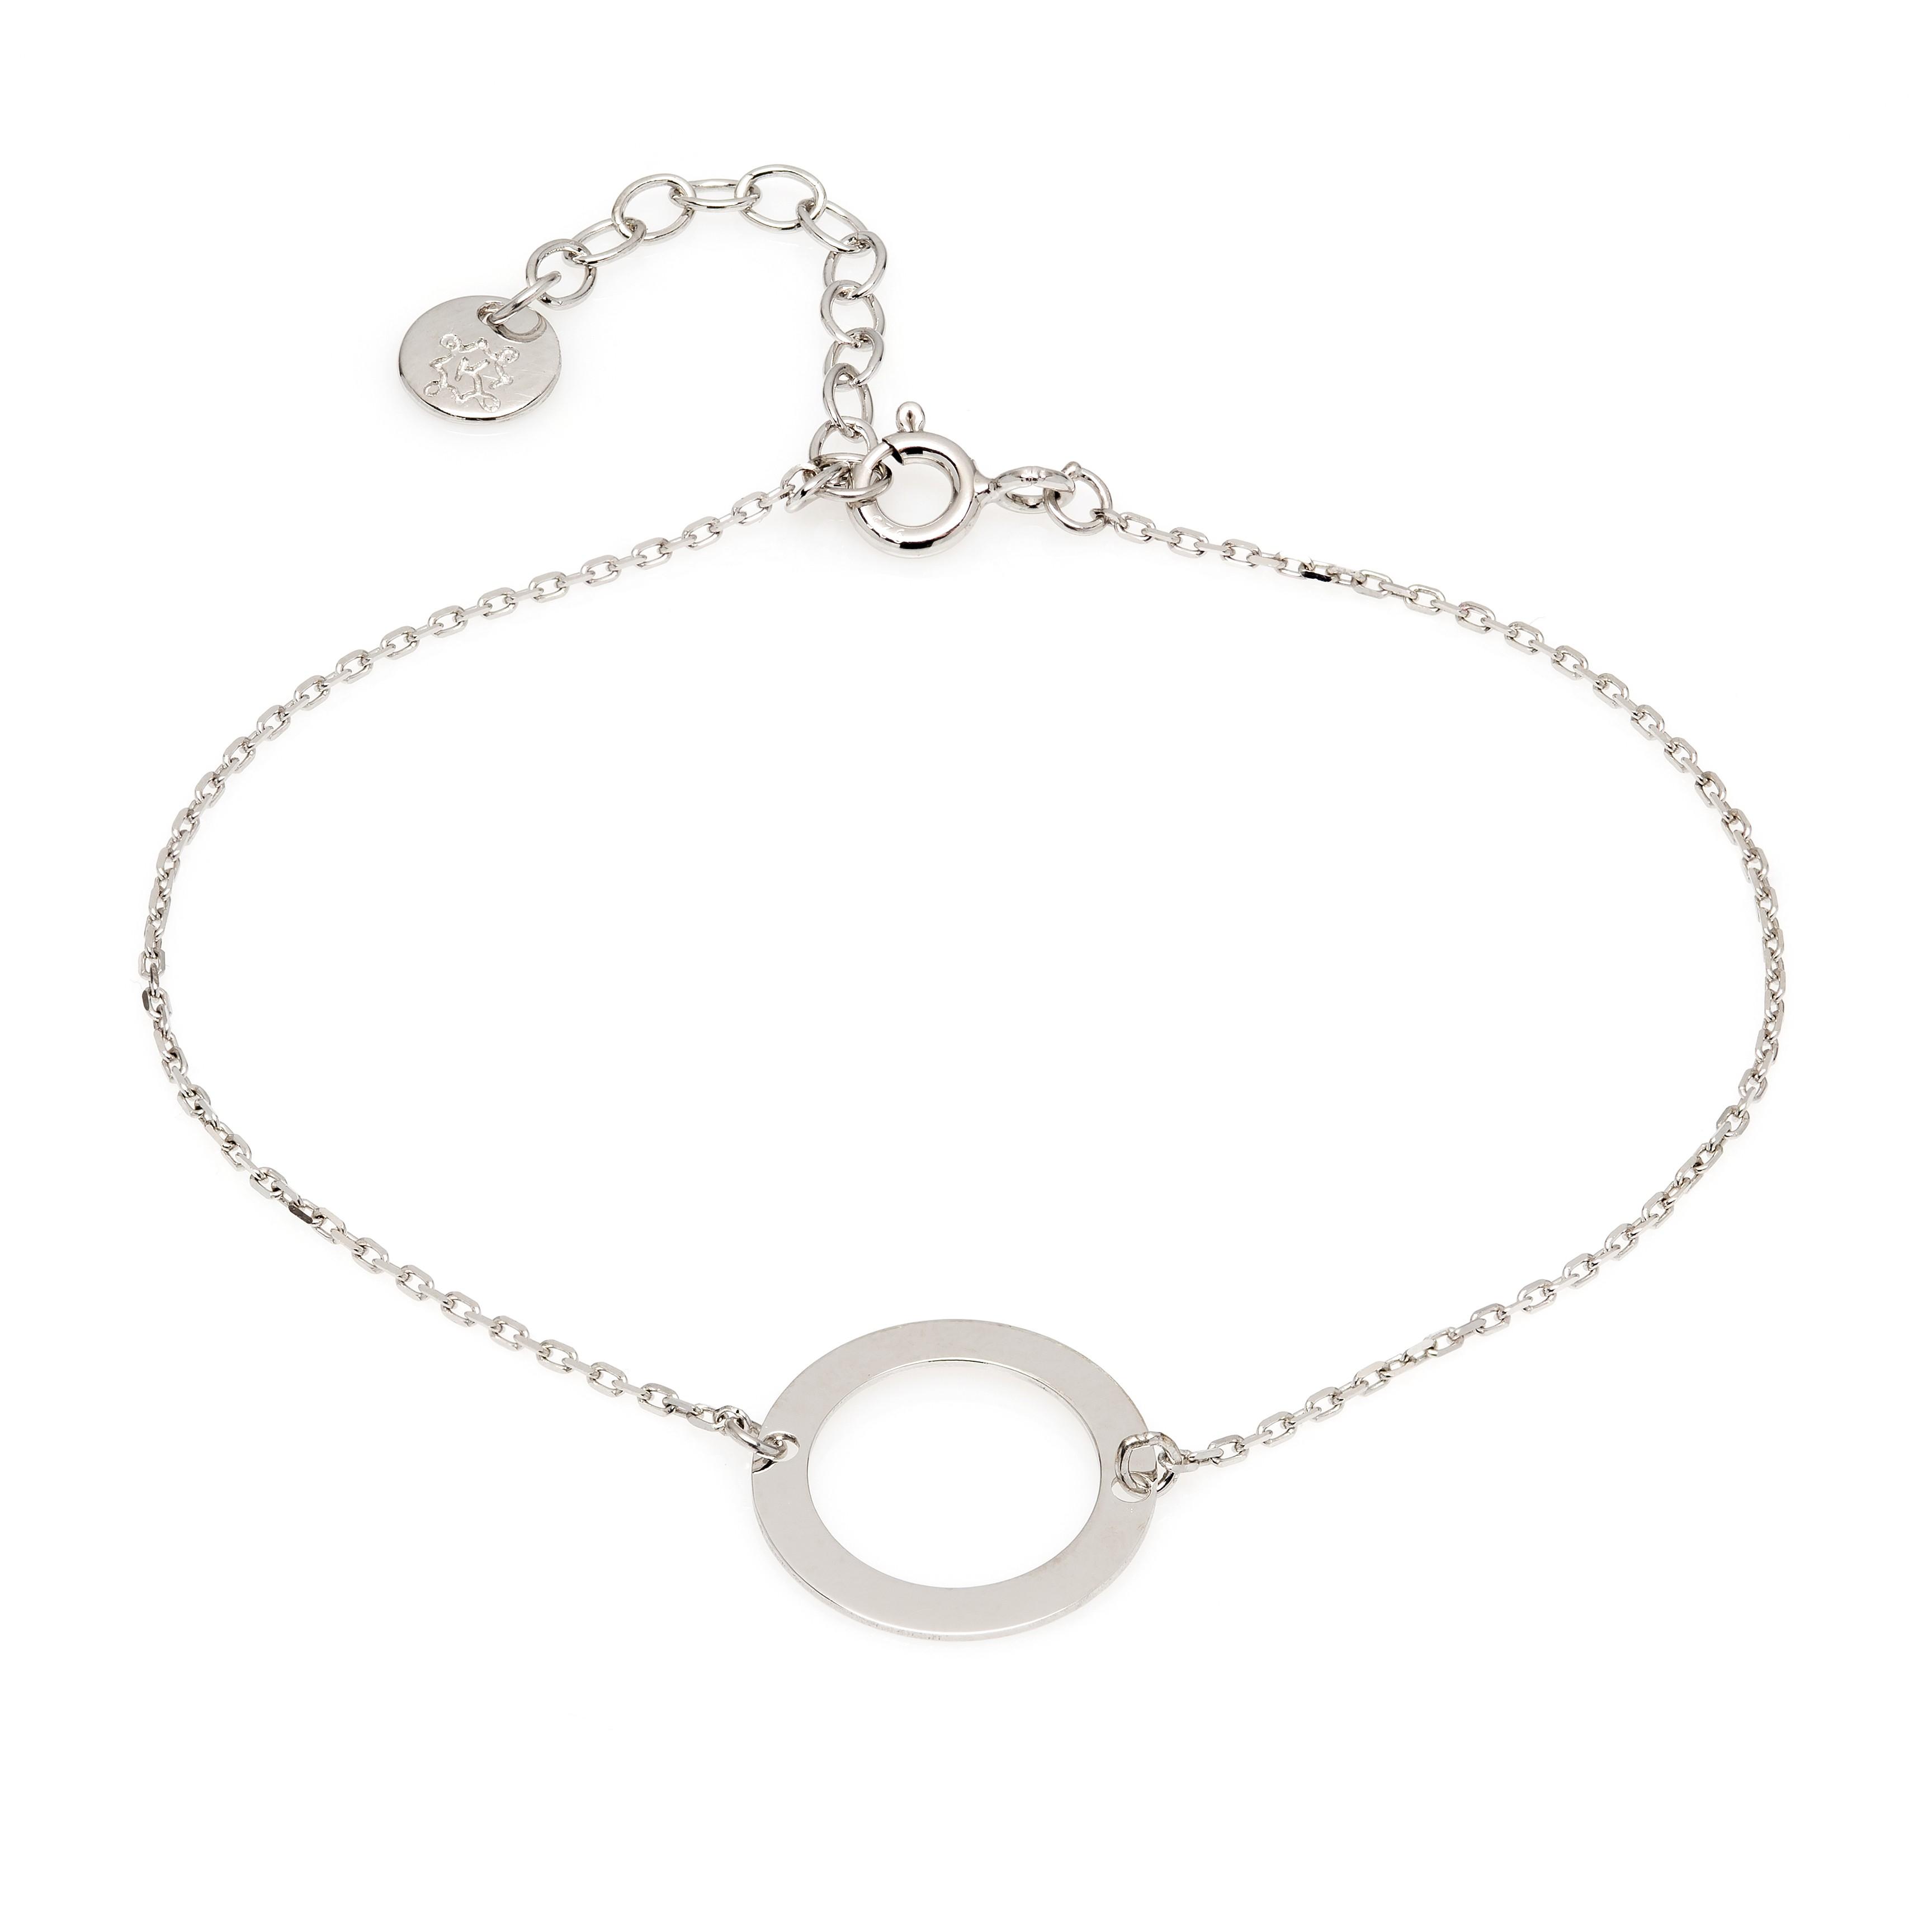 Bransoletka z okręgiem srebrna ANIA KRUK, srebrna bransoletka z kółkiem